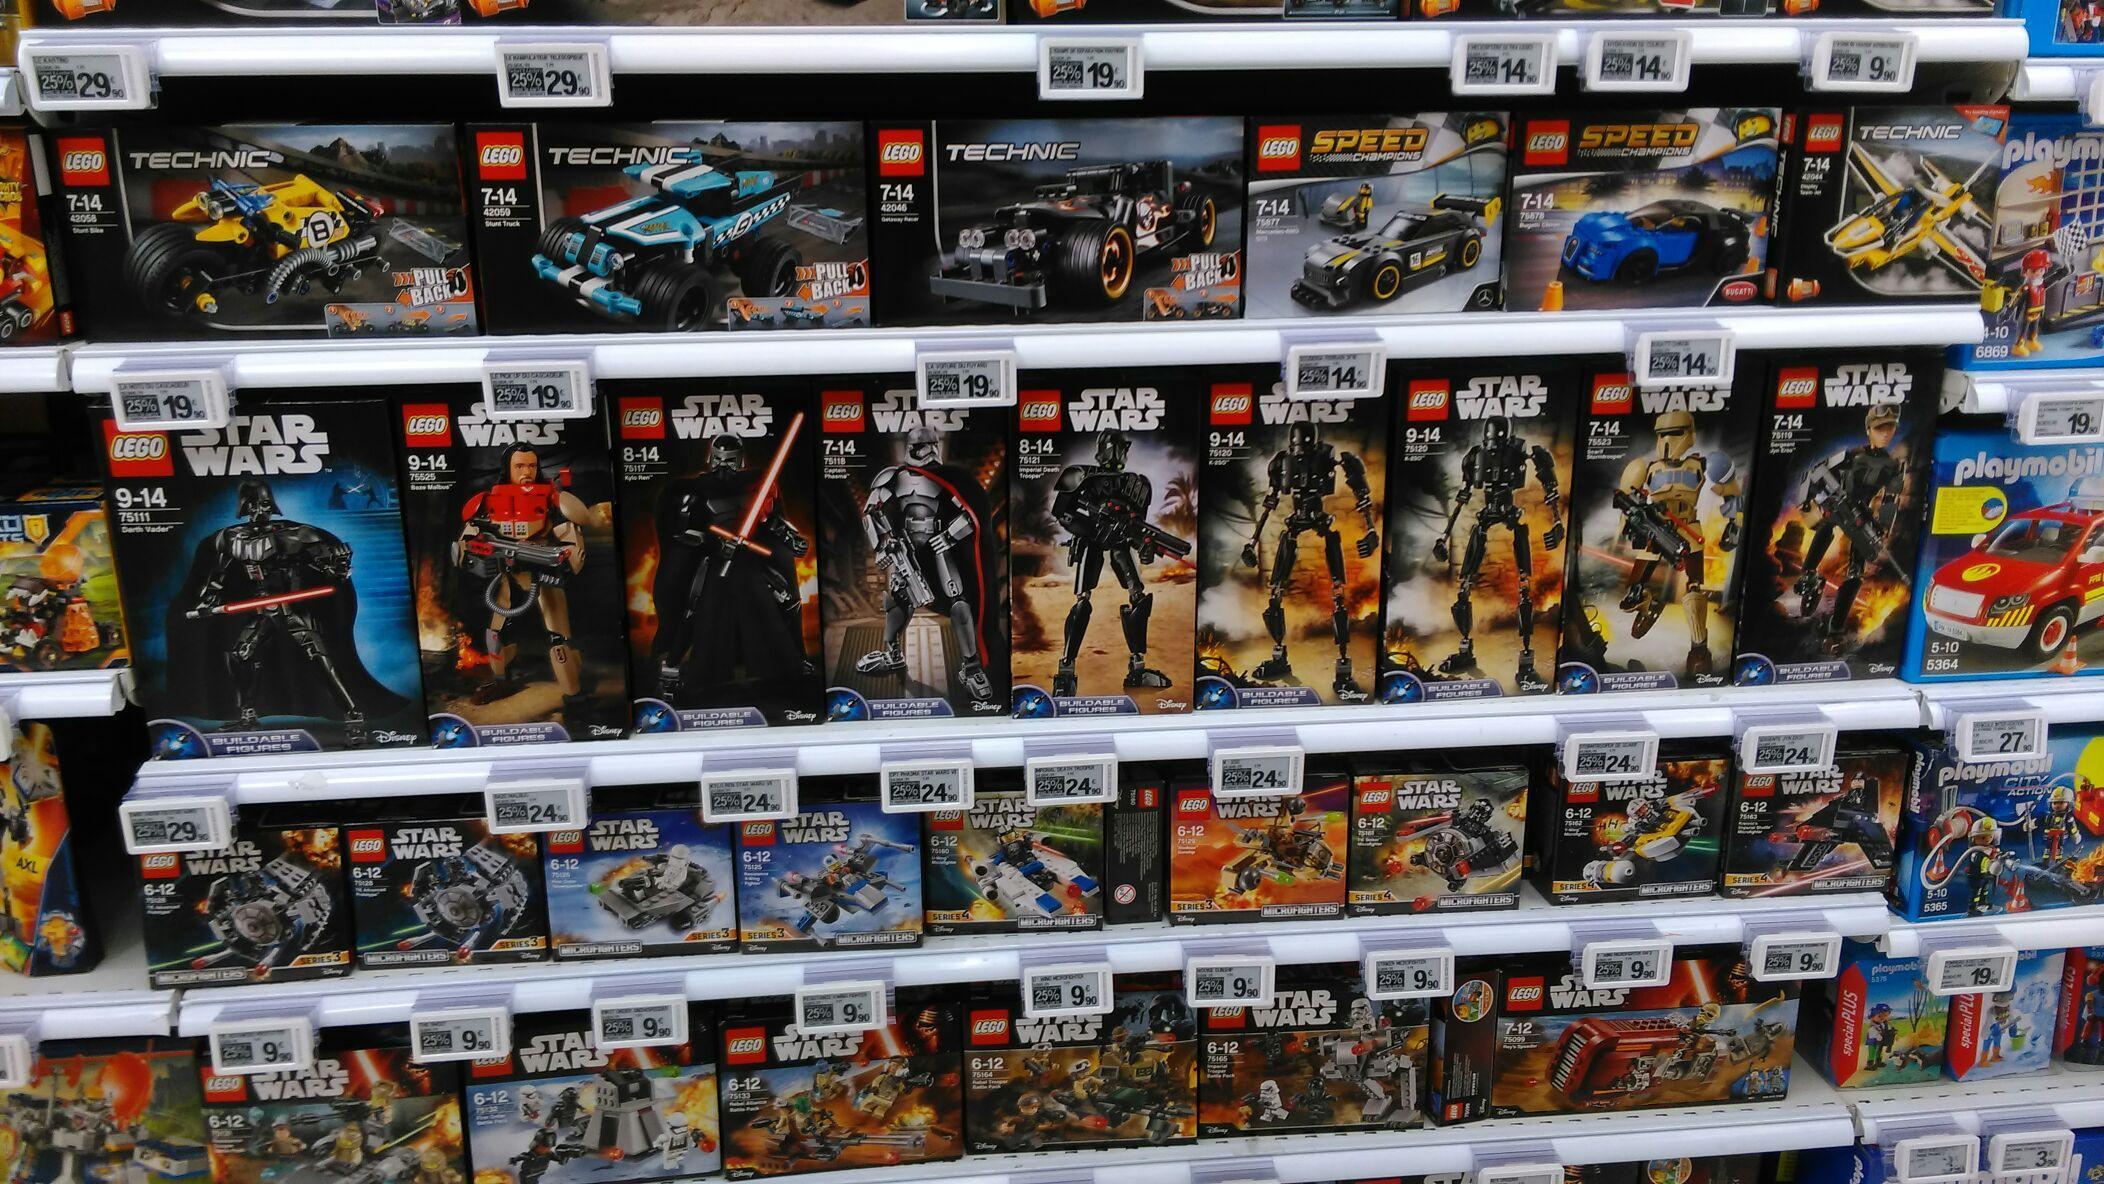 Sélection de Lego (City, Star Wars, Ninjago) avec 25% en ticket Leclerc, ex: Lego Technic (4,98€ en bon d'achat)